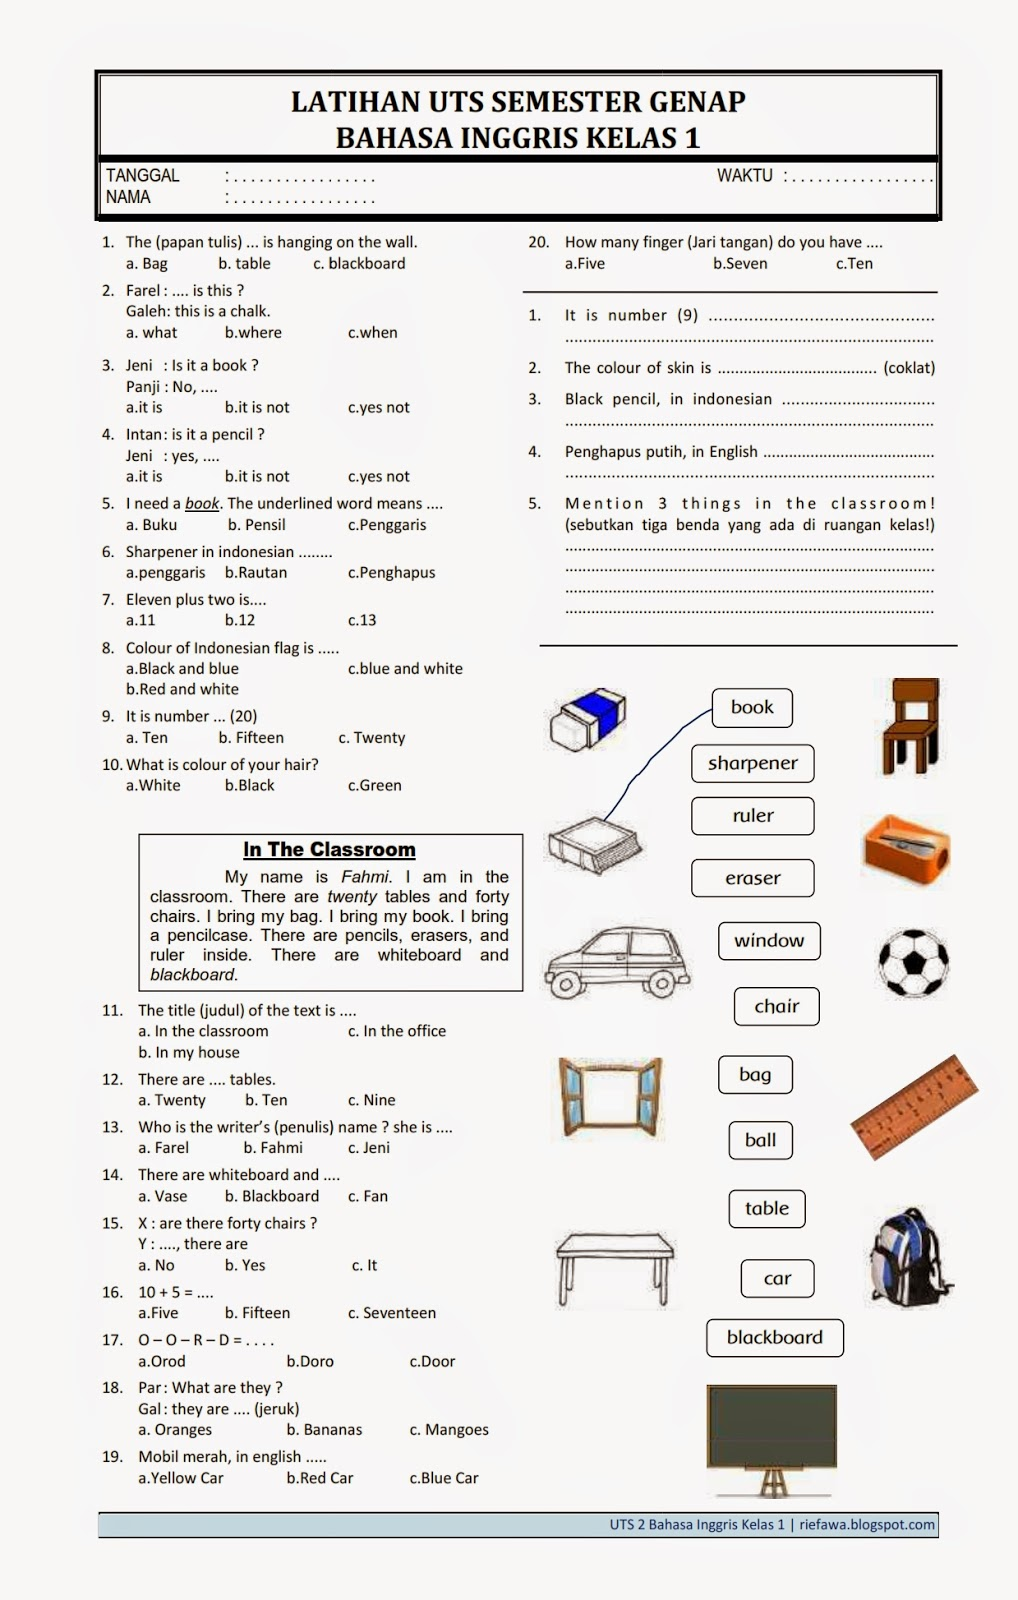 Download Soal UTS 2 Bahasa Inggris Kelas 1 ~ Rief Awa Blog ...